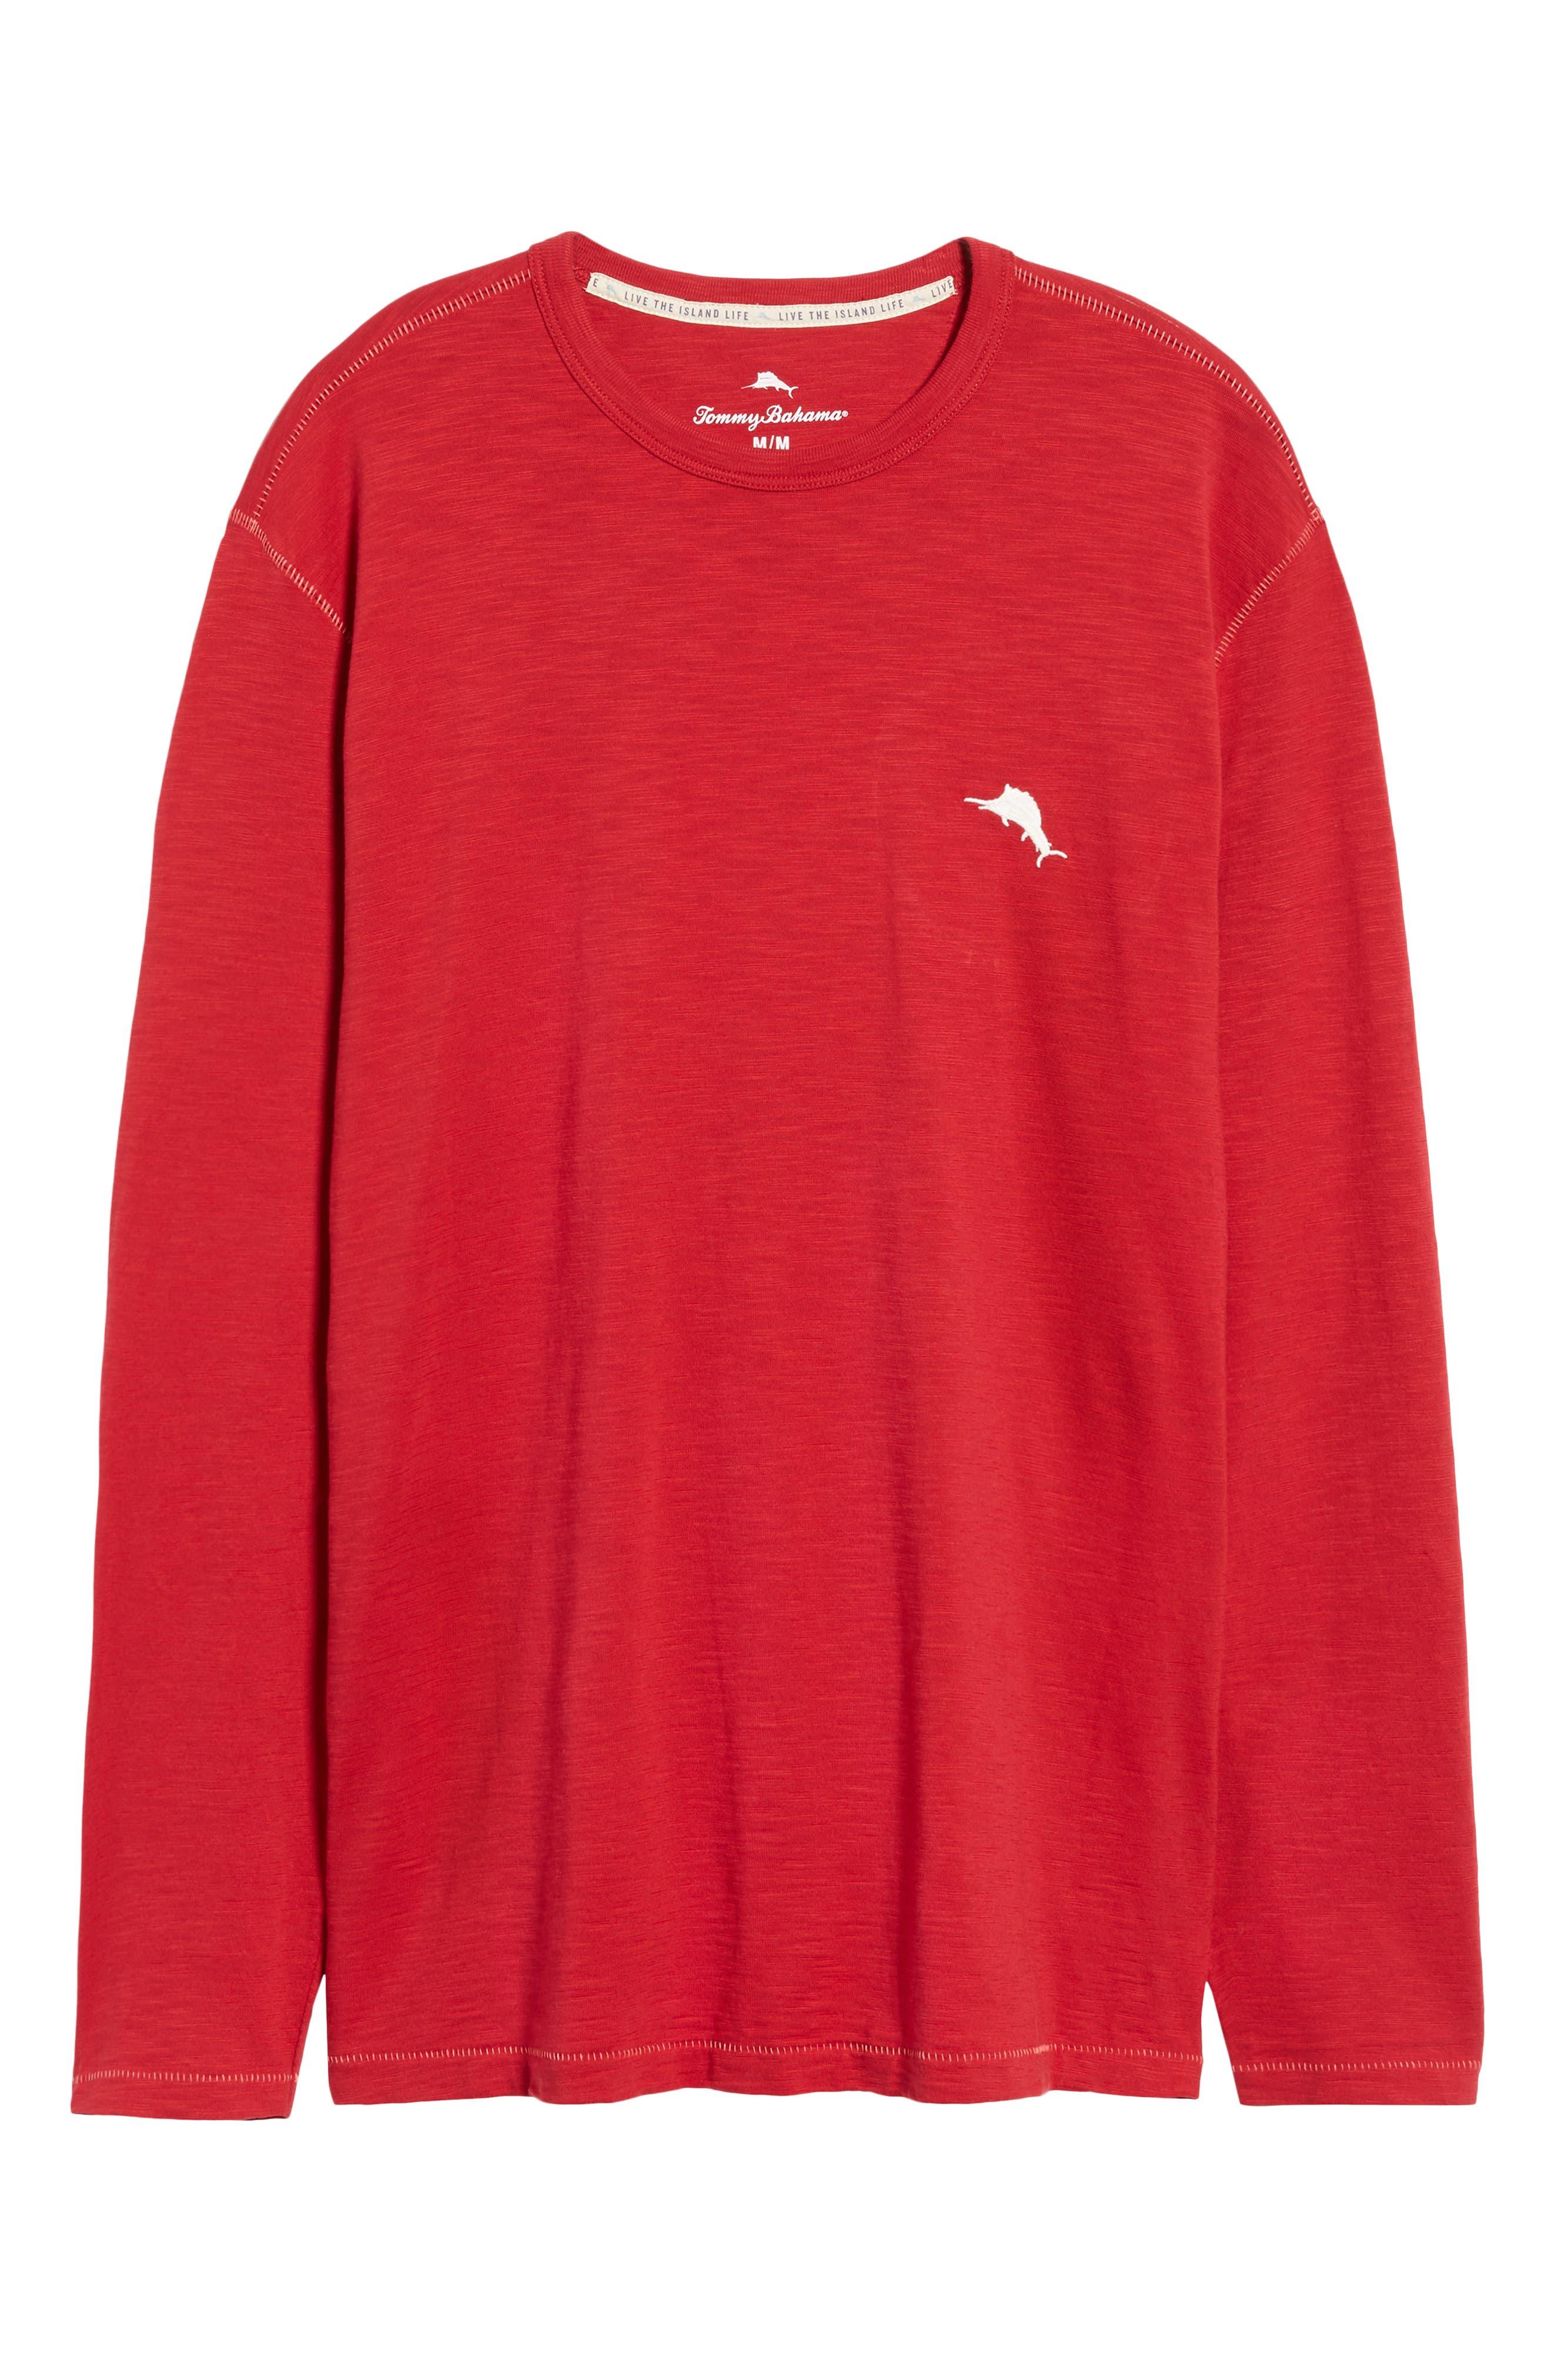 Mele Kalikimaka T-Shirt,                             Alternate thumbnail 6, color,                             SCOOTER RED